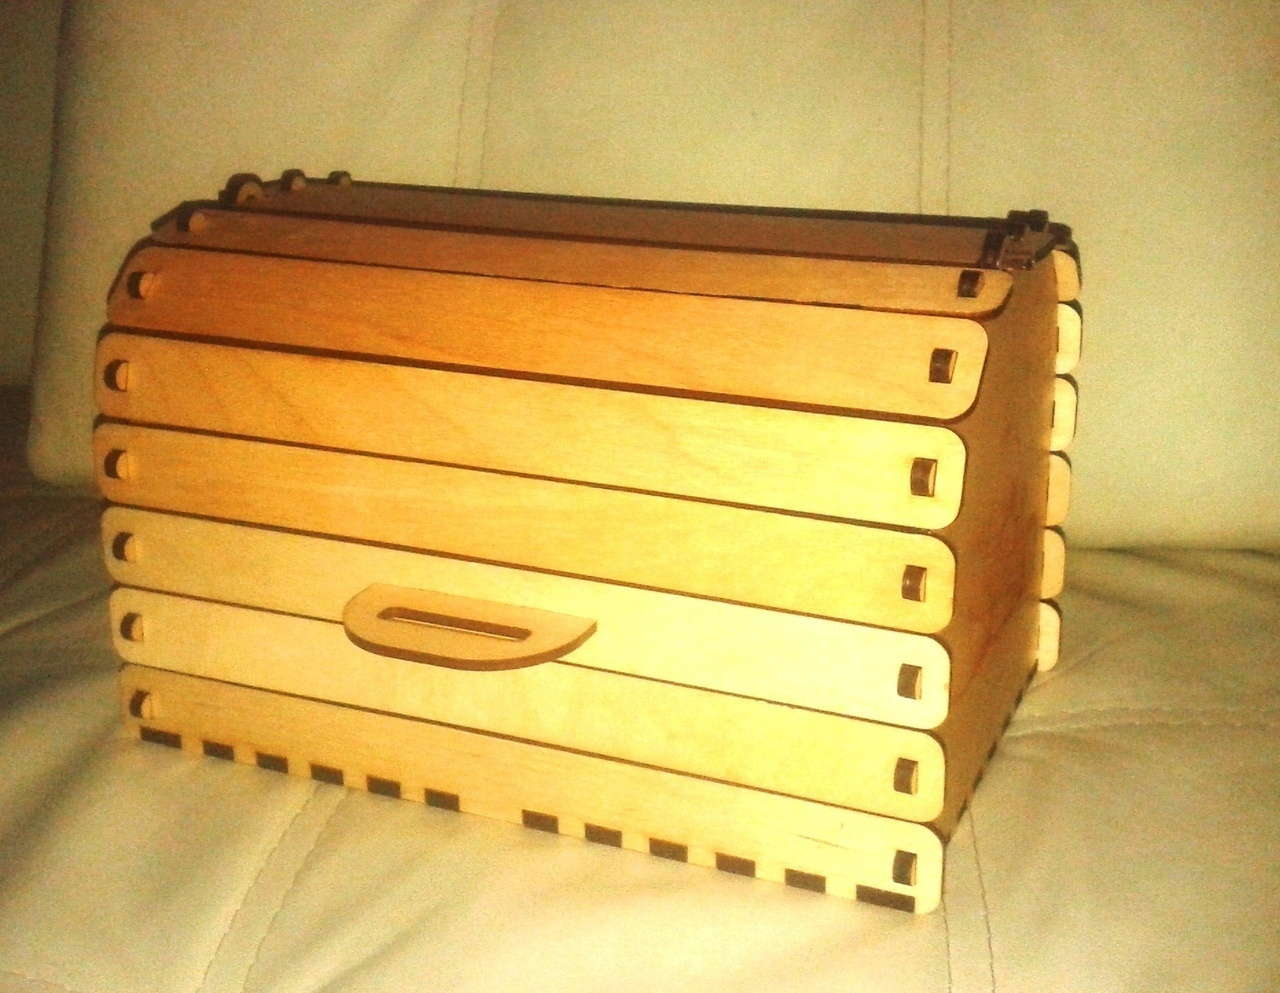 Laser Cut Bread Box Bread Basket With Lid Bread Bin Bread Storage Free Vector